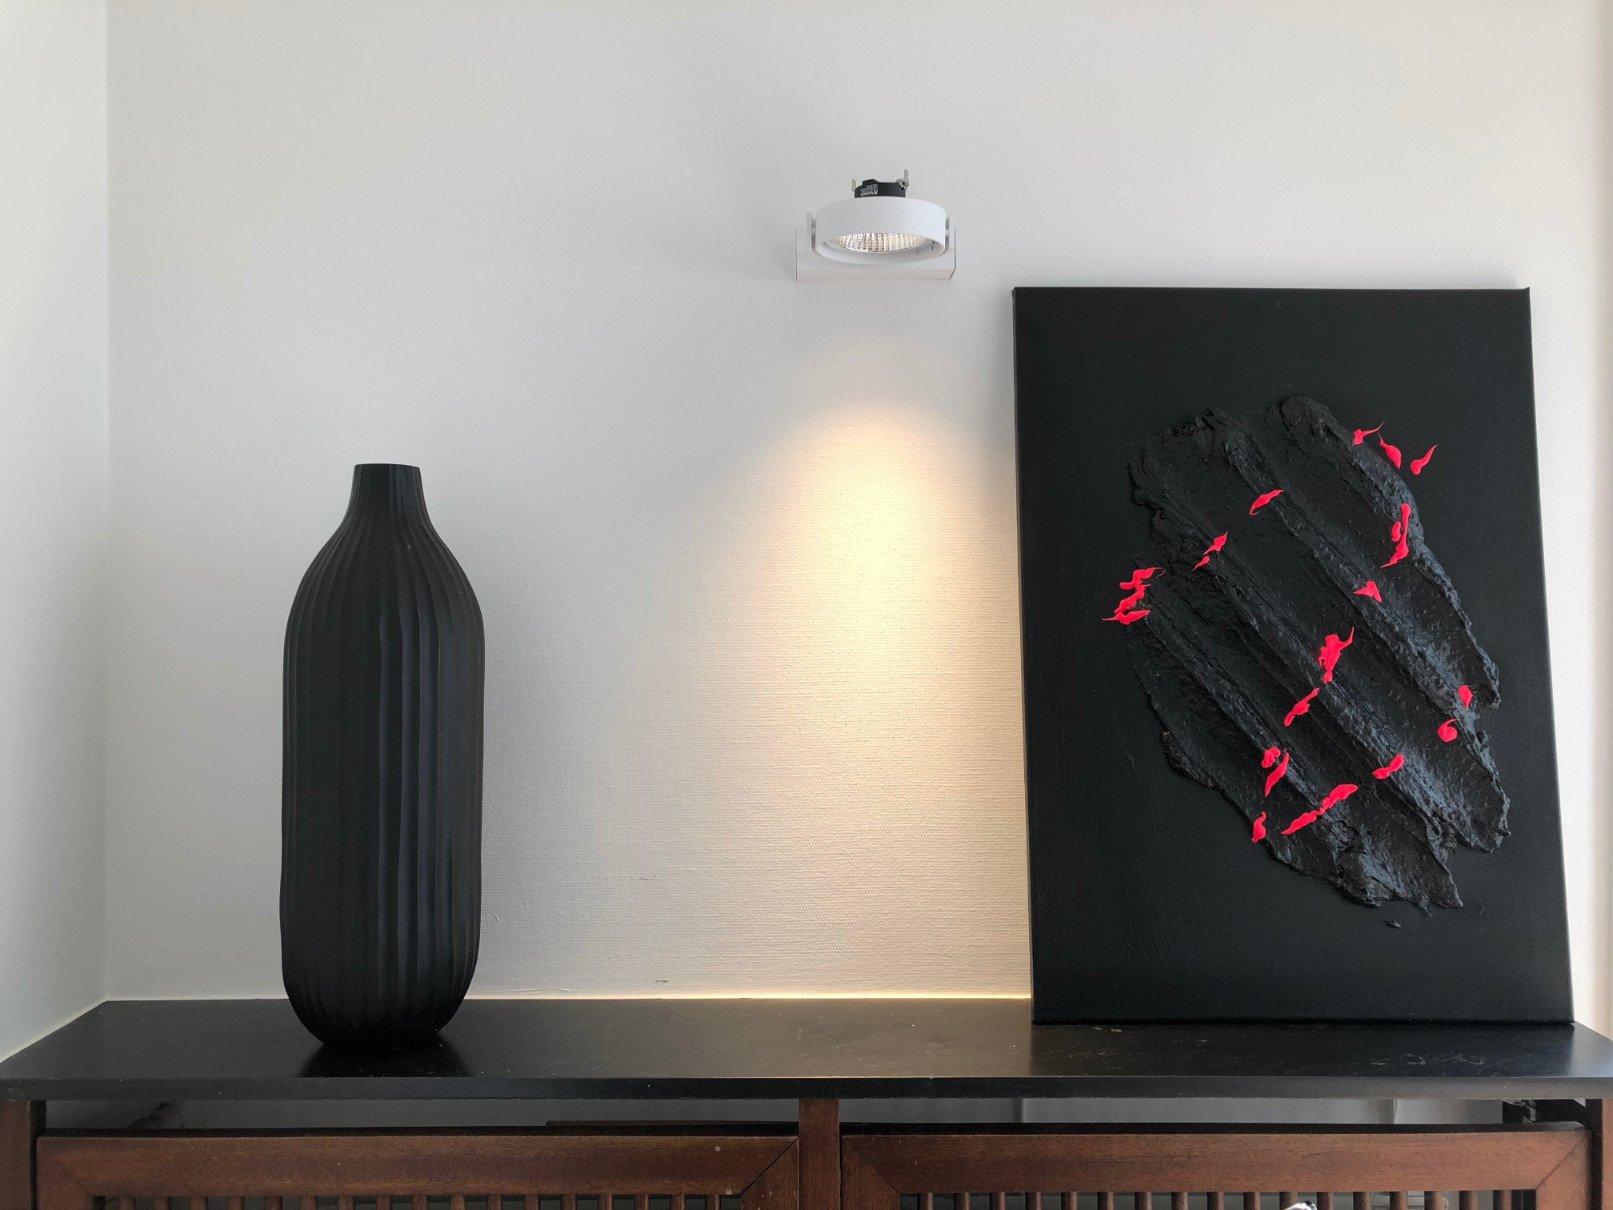 Rietveldprojects-Villa Were Di - Te Koop : Te Huur (per week)10.jpg